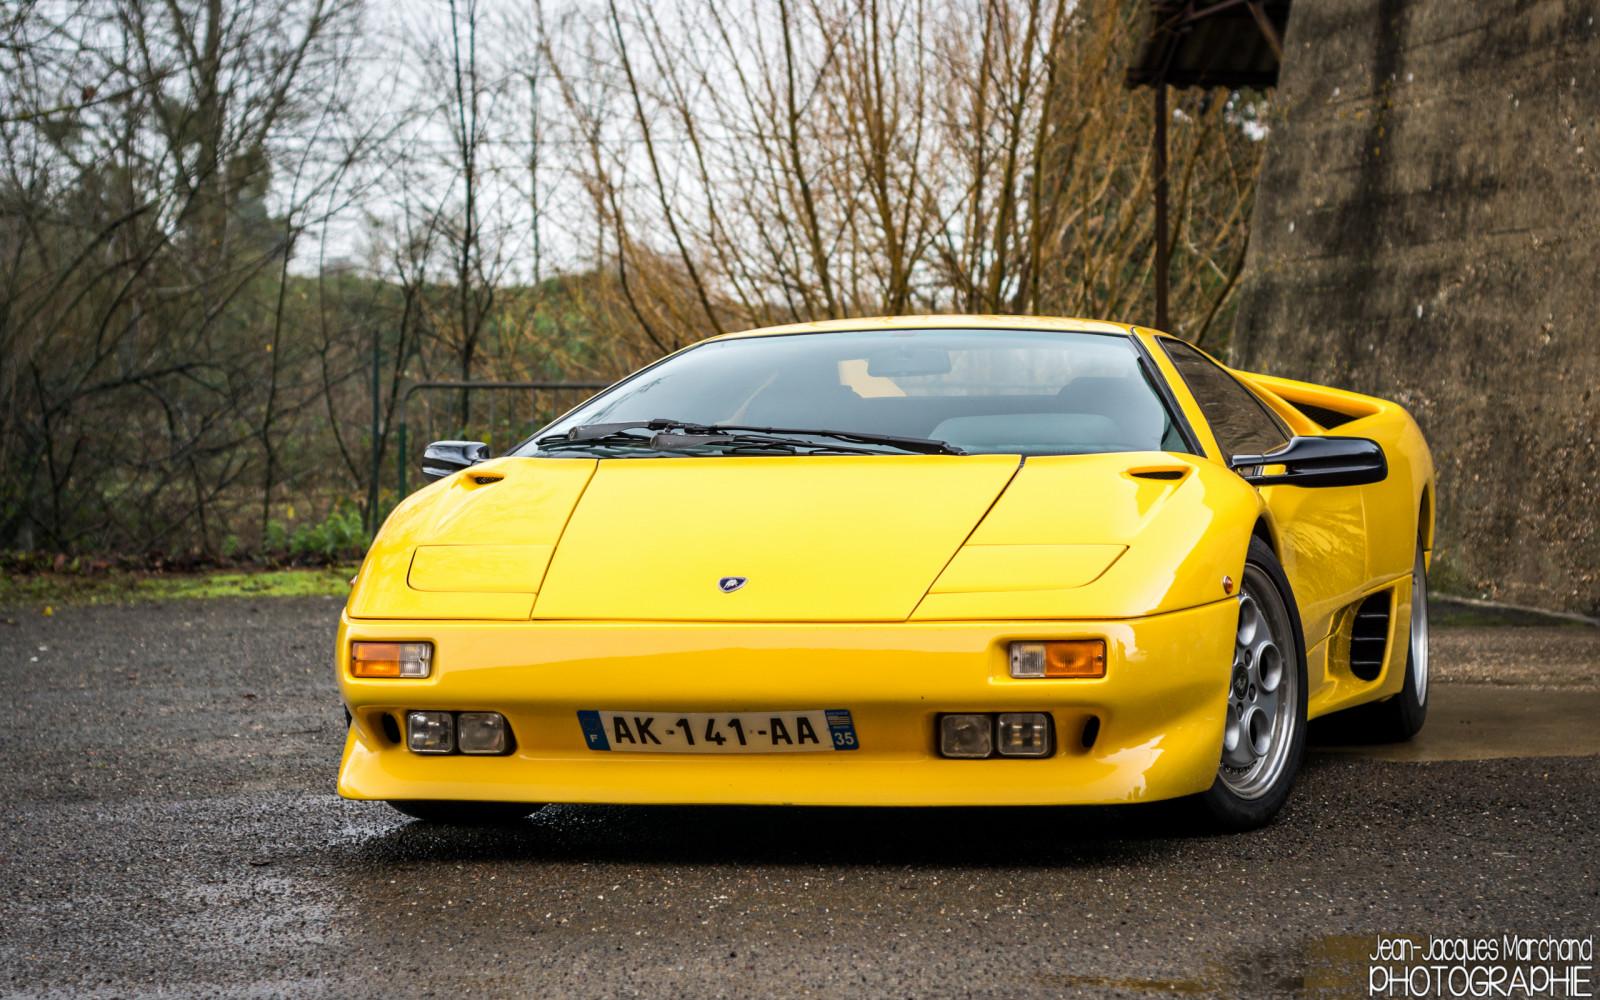 Wallpaper : Old, Supercars, Yellow, Nikon, Lamborghini